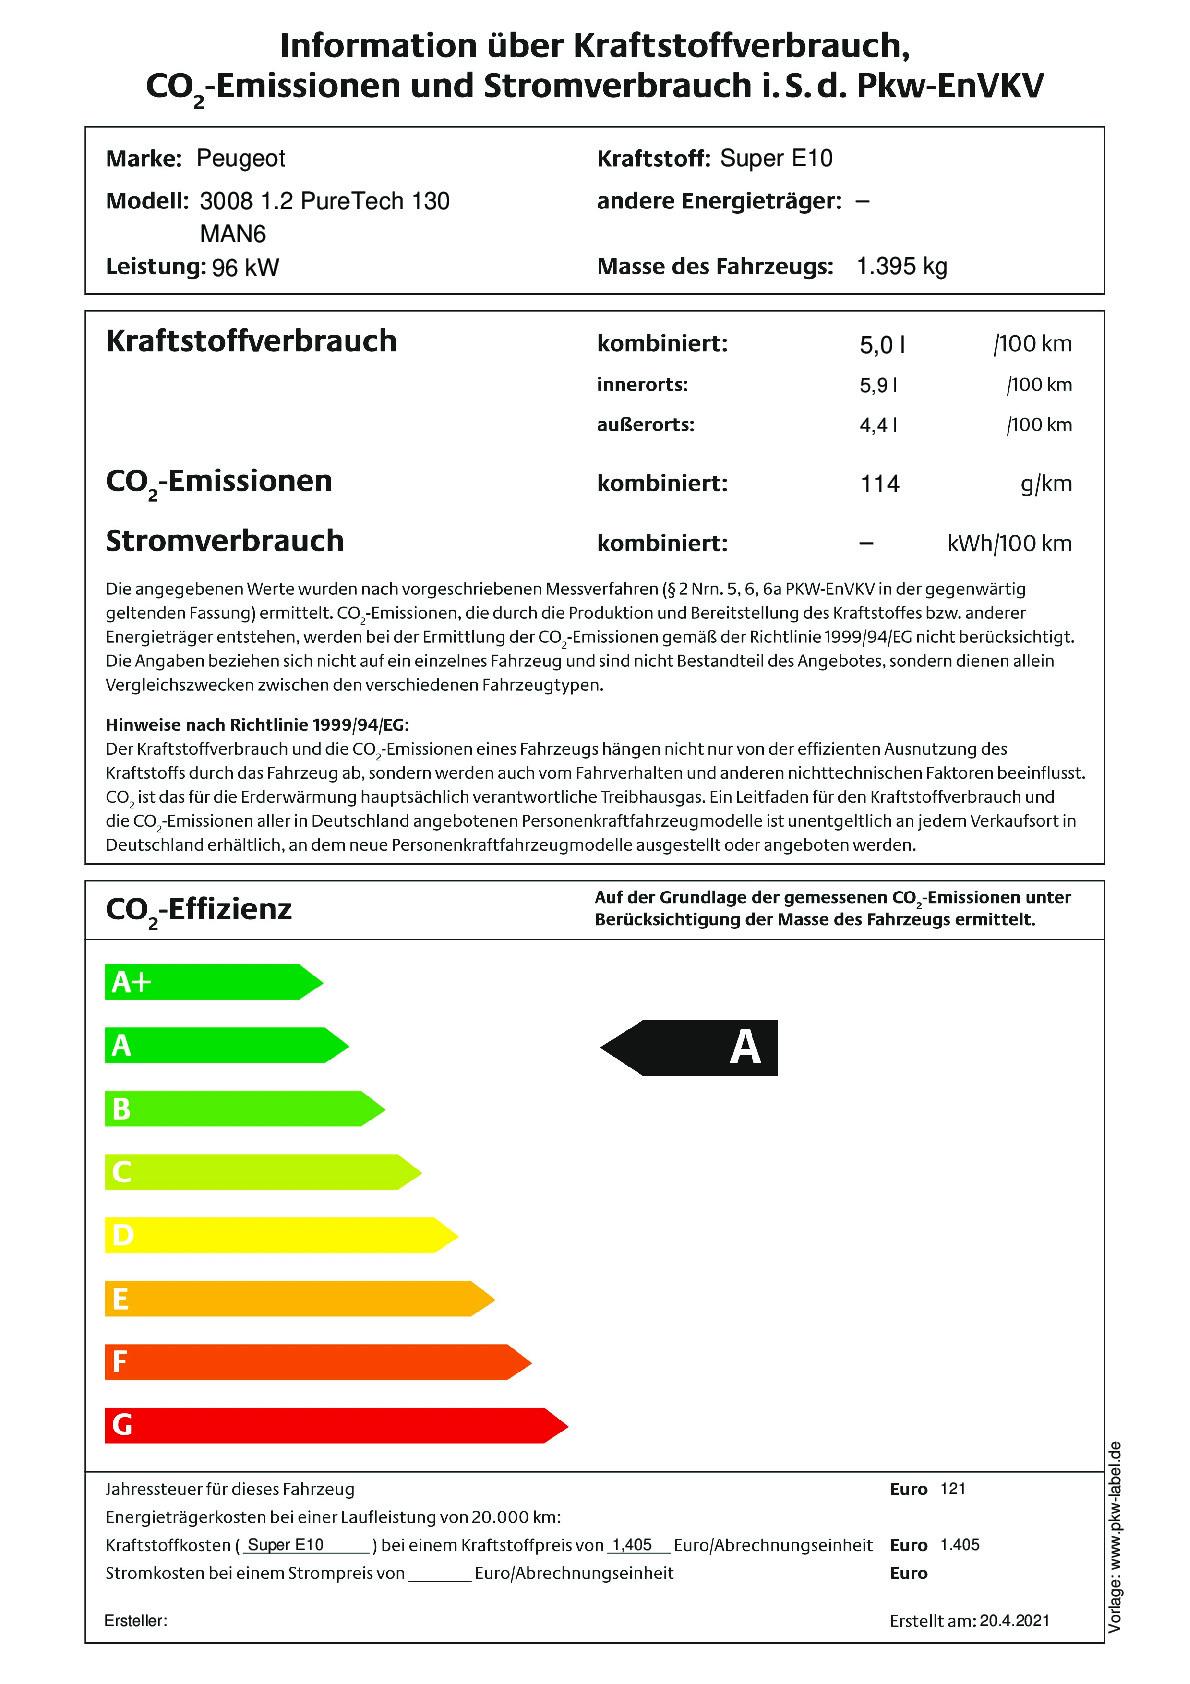 Energielabel 1.2 PureTech 130 S&S Man6